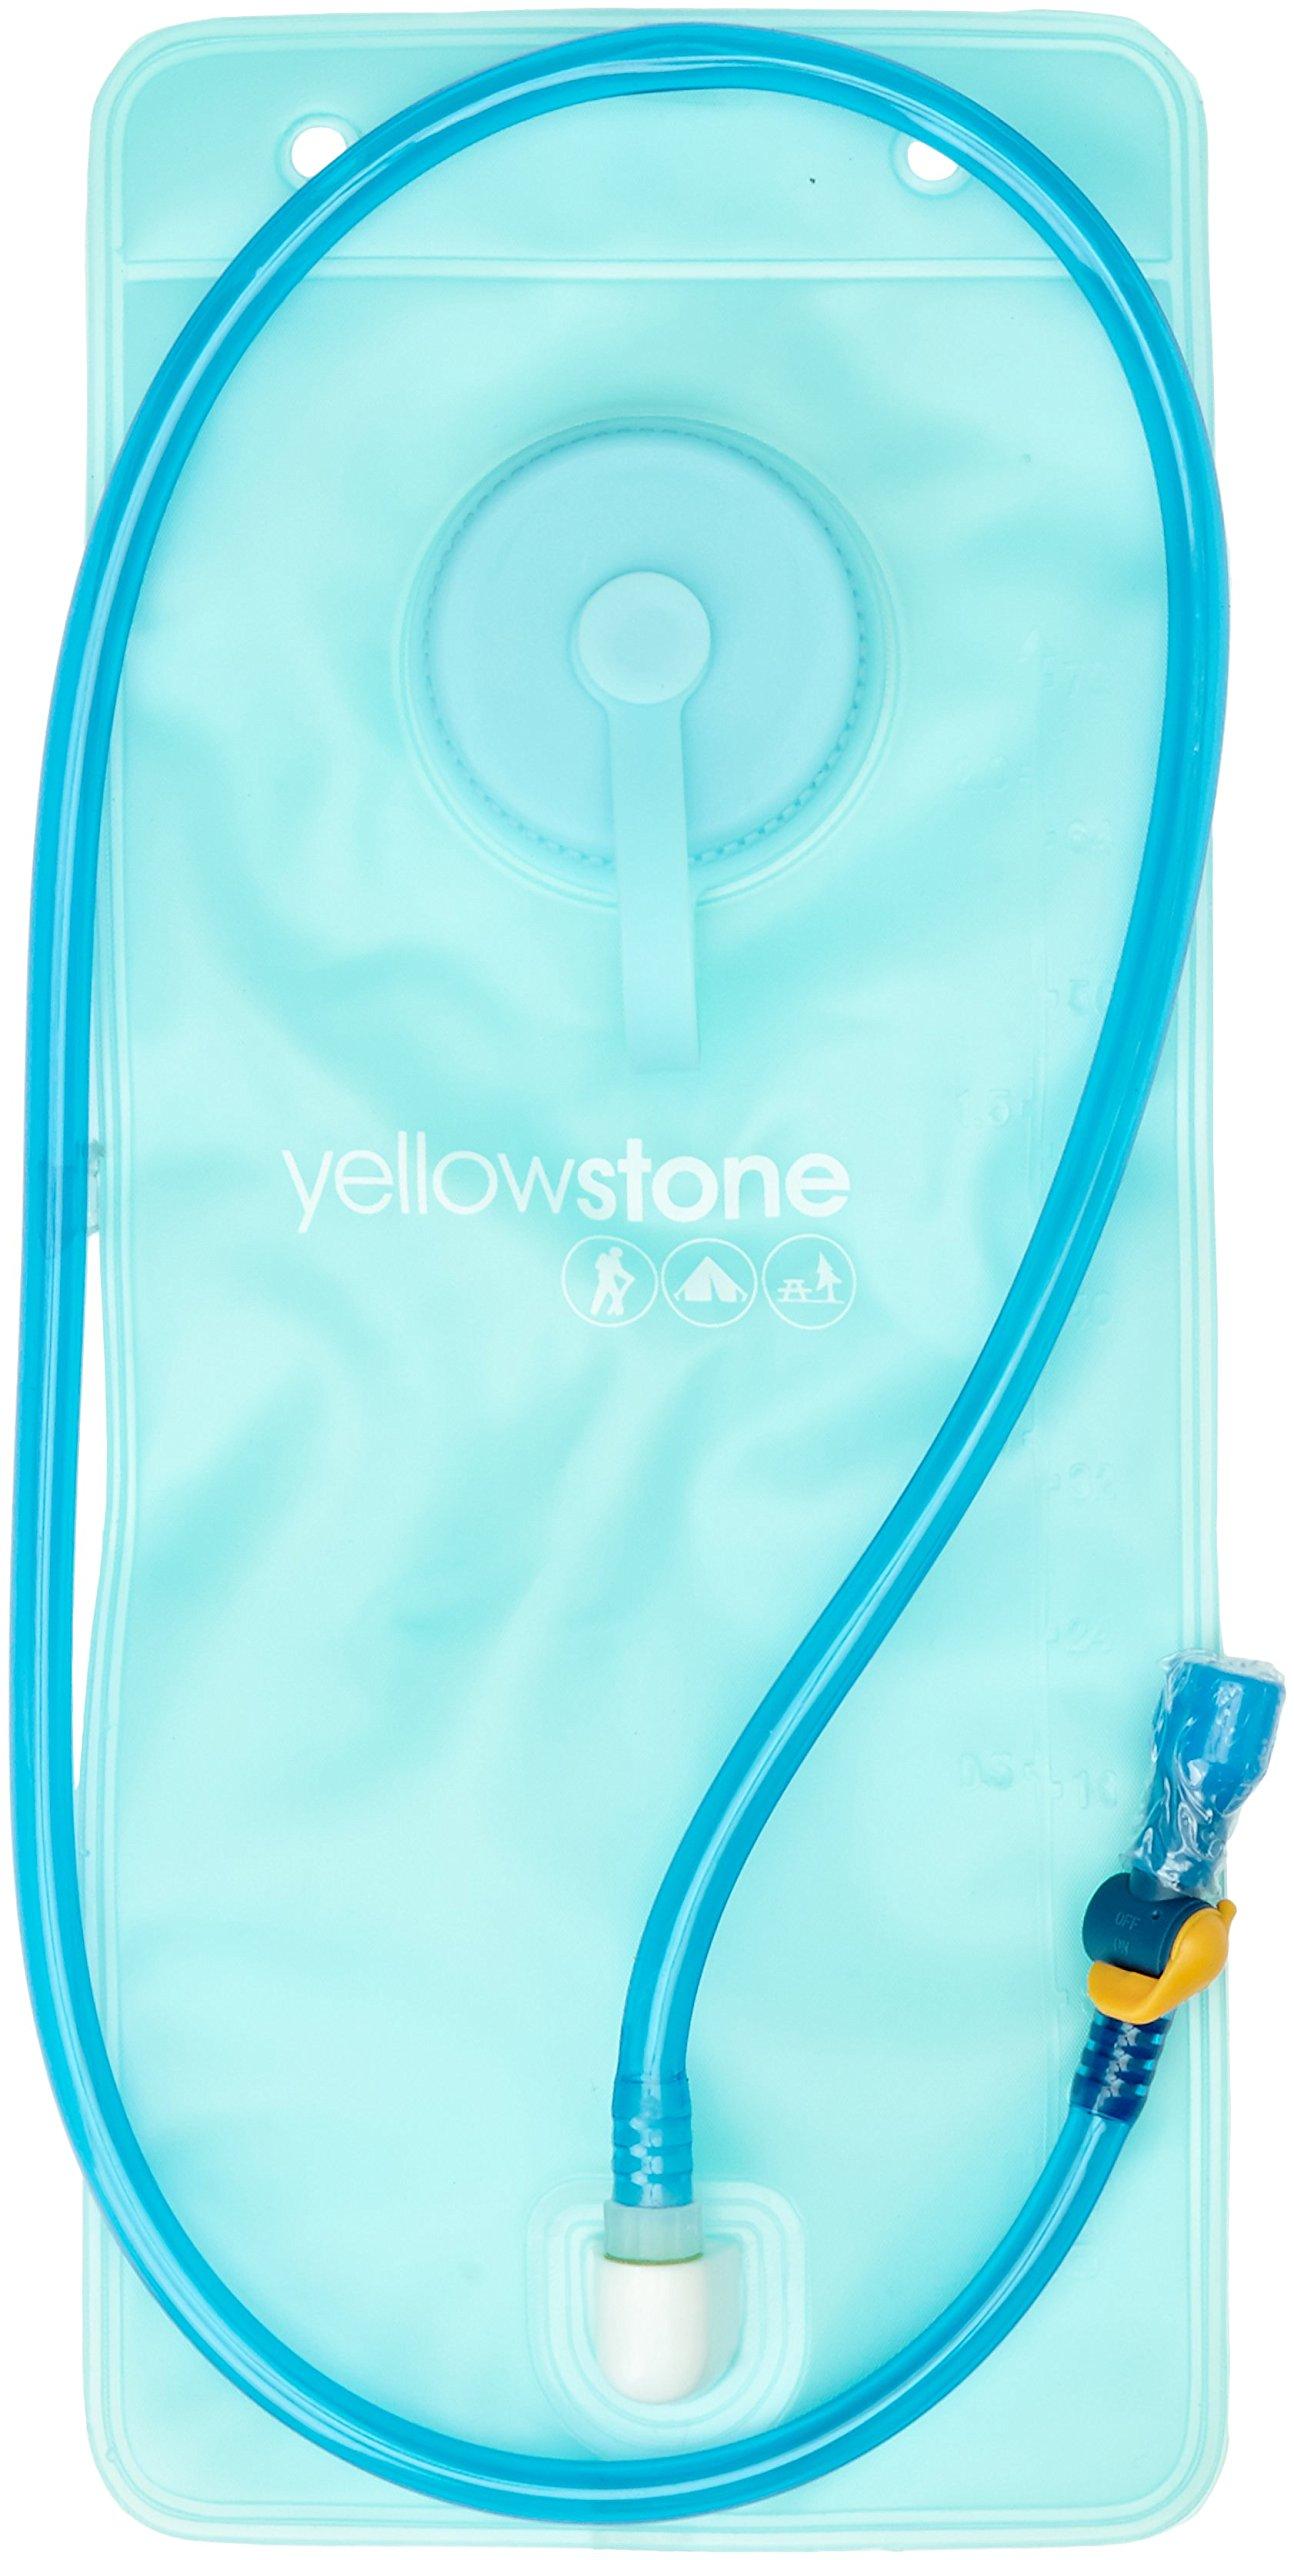 Yellowstone Hydration Bladder - Blue, 1.5 Litre